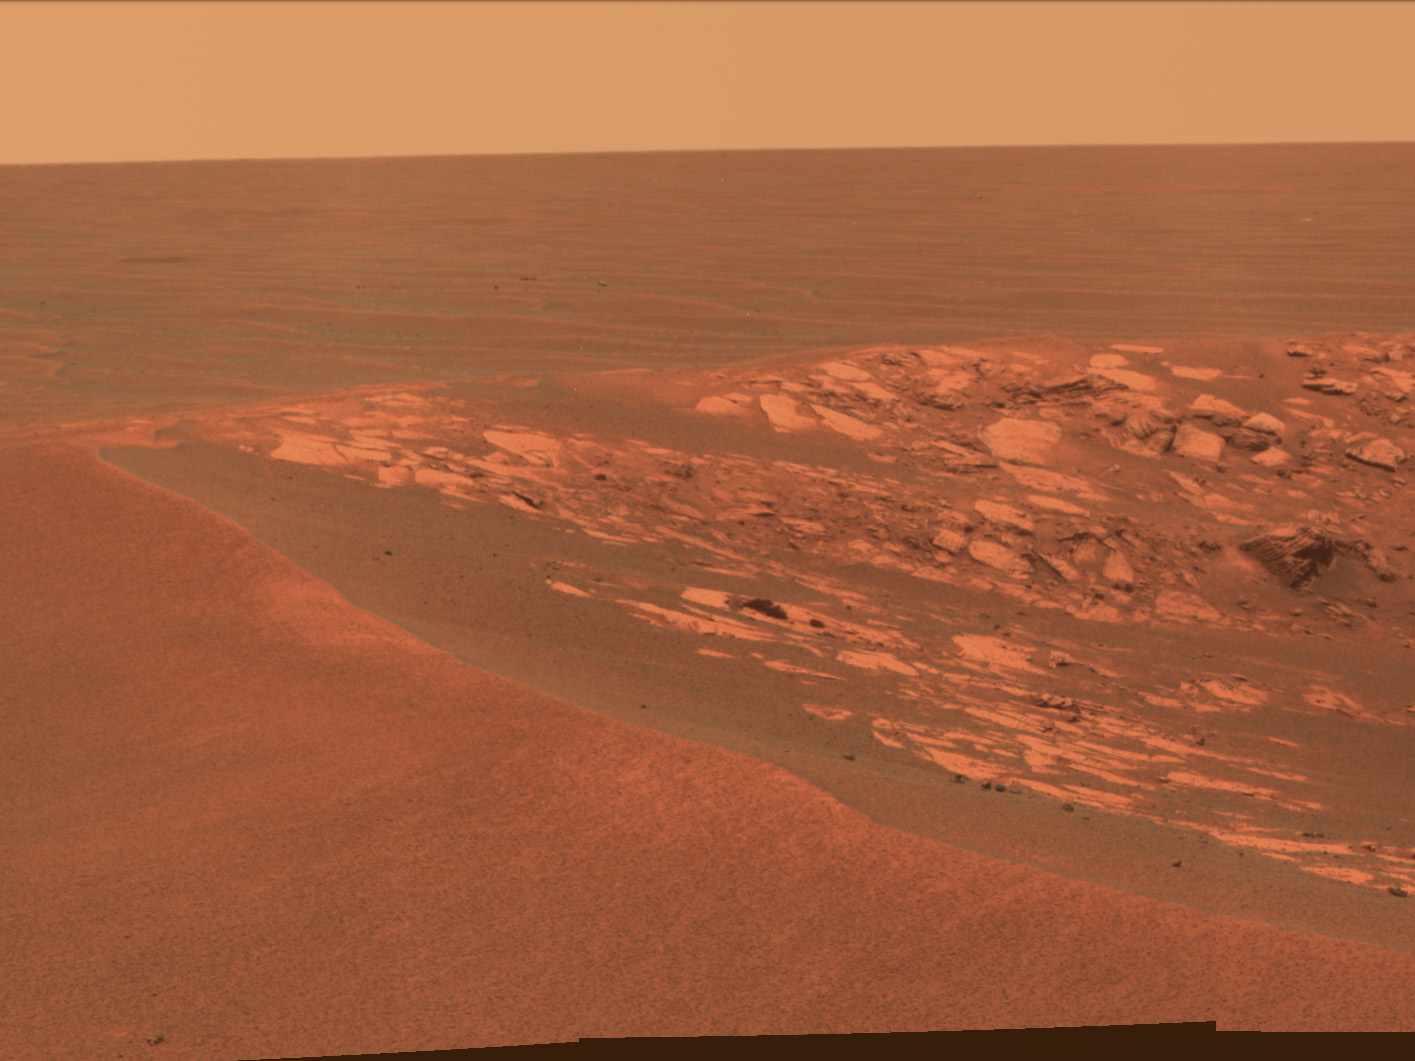 Krater Intrepid / Credits: NASA-JPL